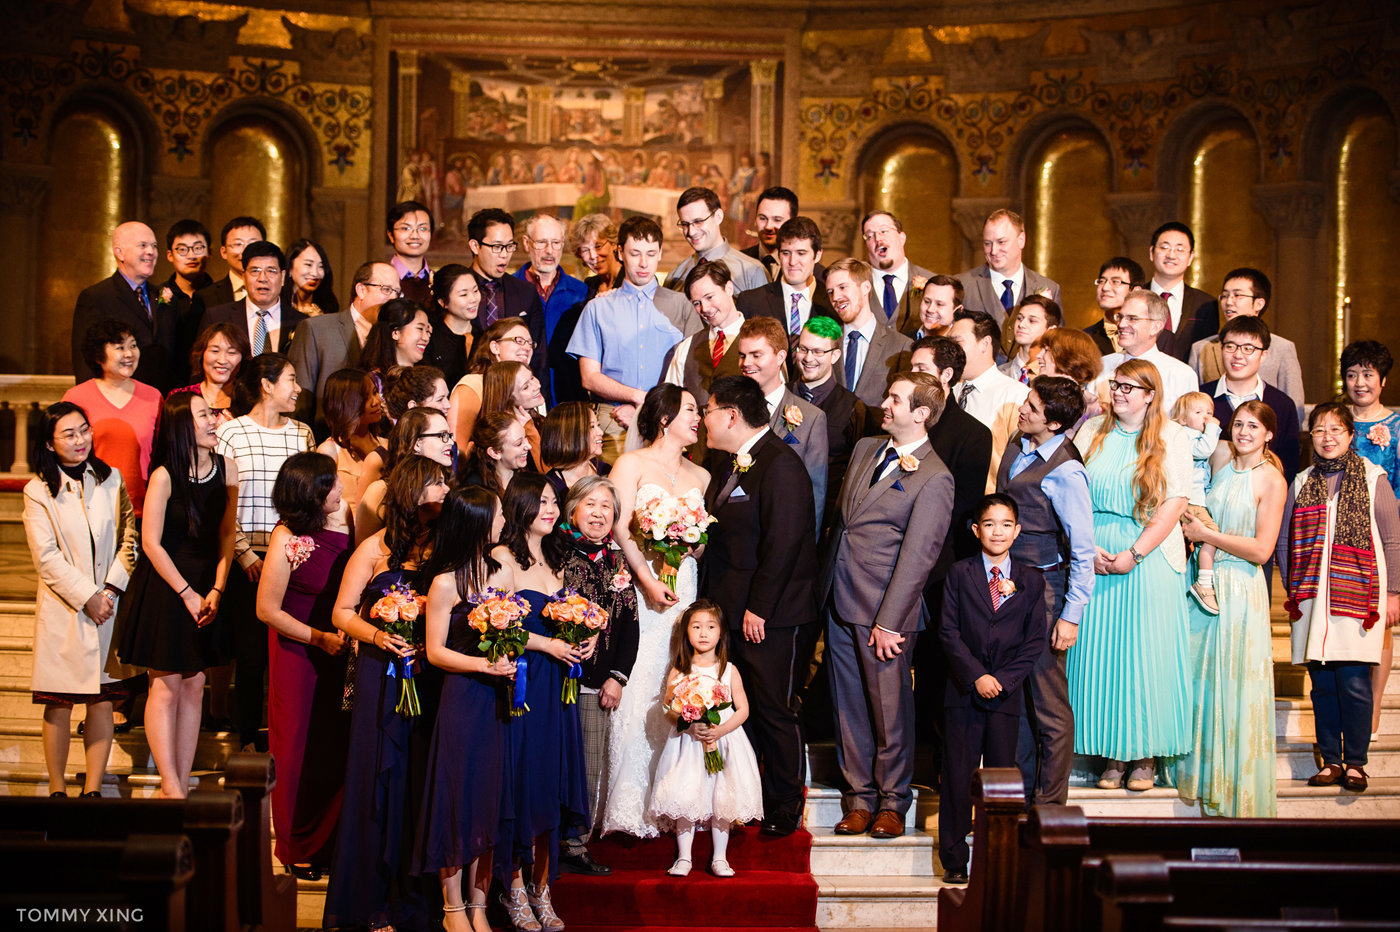 STANFORD MEMORIAL CHURCH WEDDING - Wenjie & Chengcheng - SAN FRANCISCO BAY AREA 斯坦福教堂婚礼跟拍 - 洛杉矶婚礼婚纱照摄影师 Tommy Xing Photography136.jpg